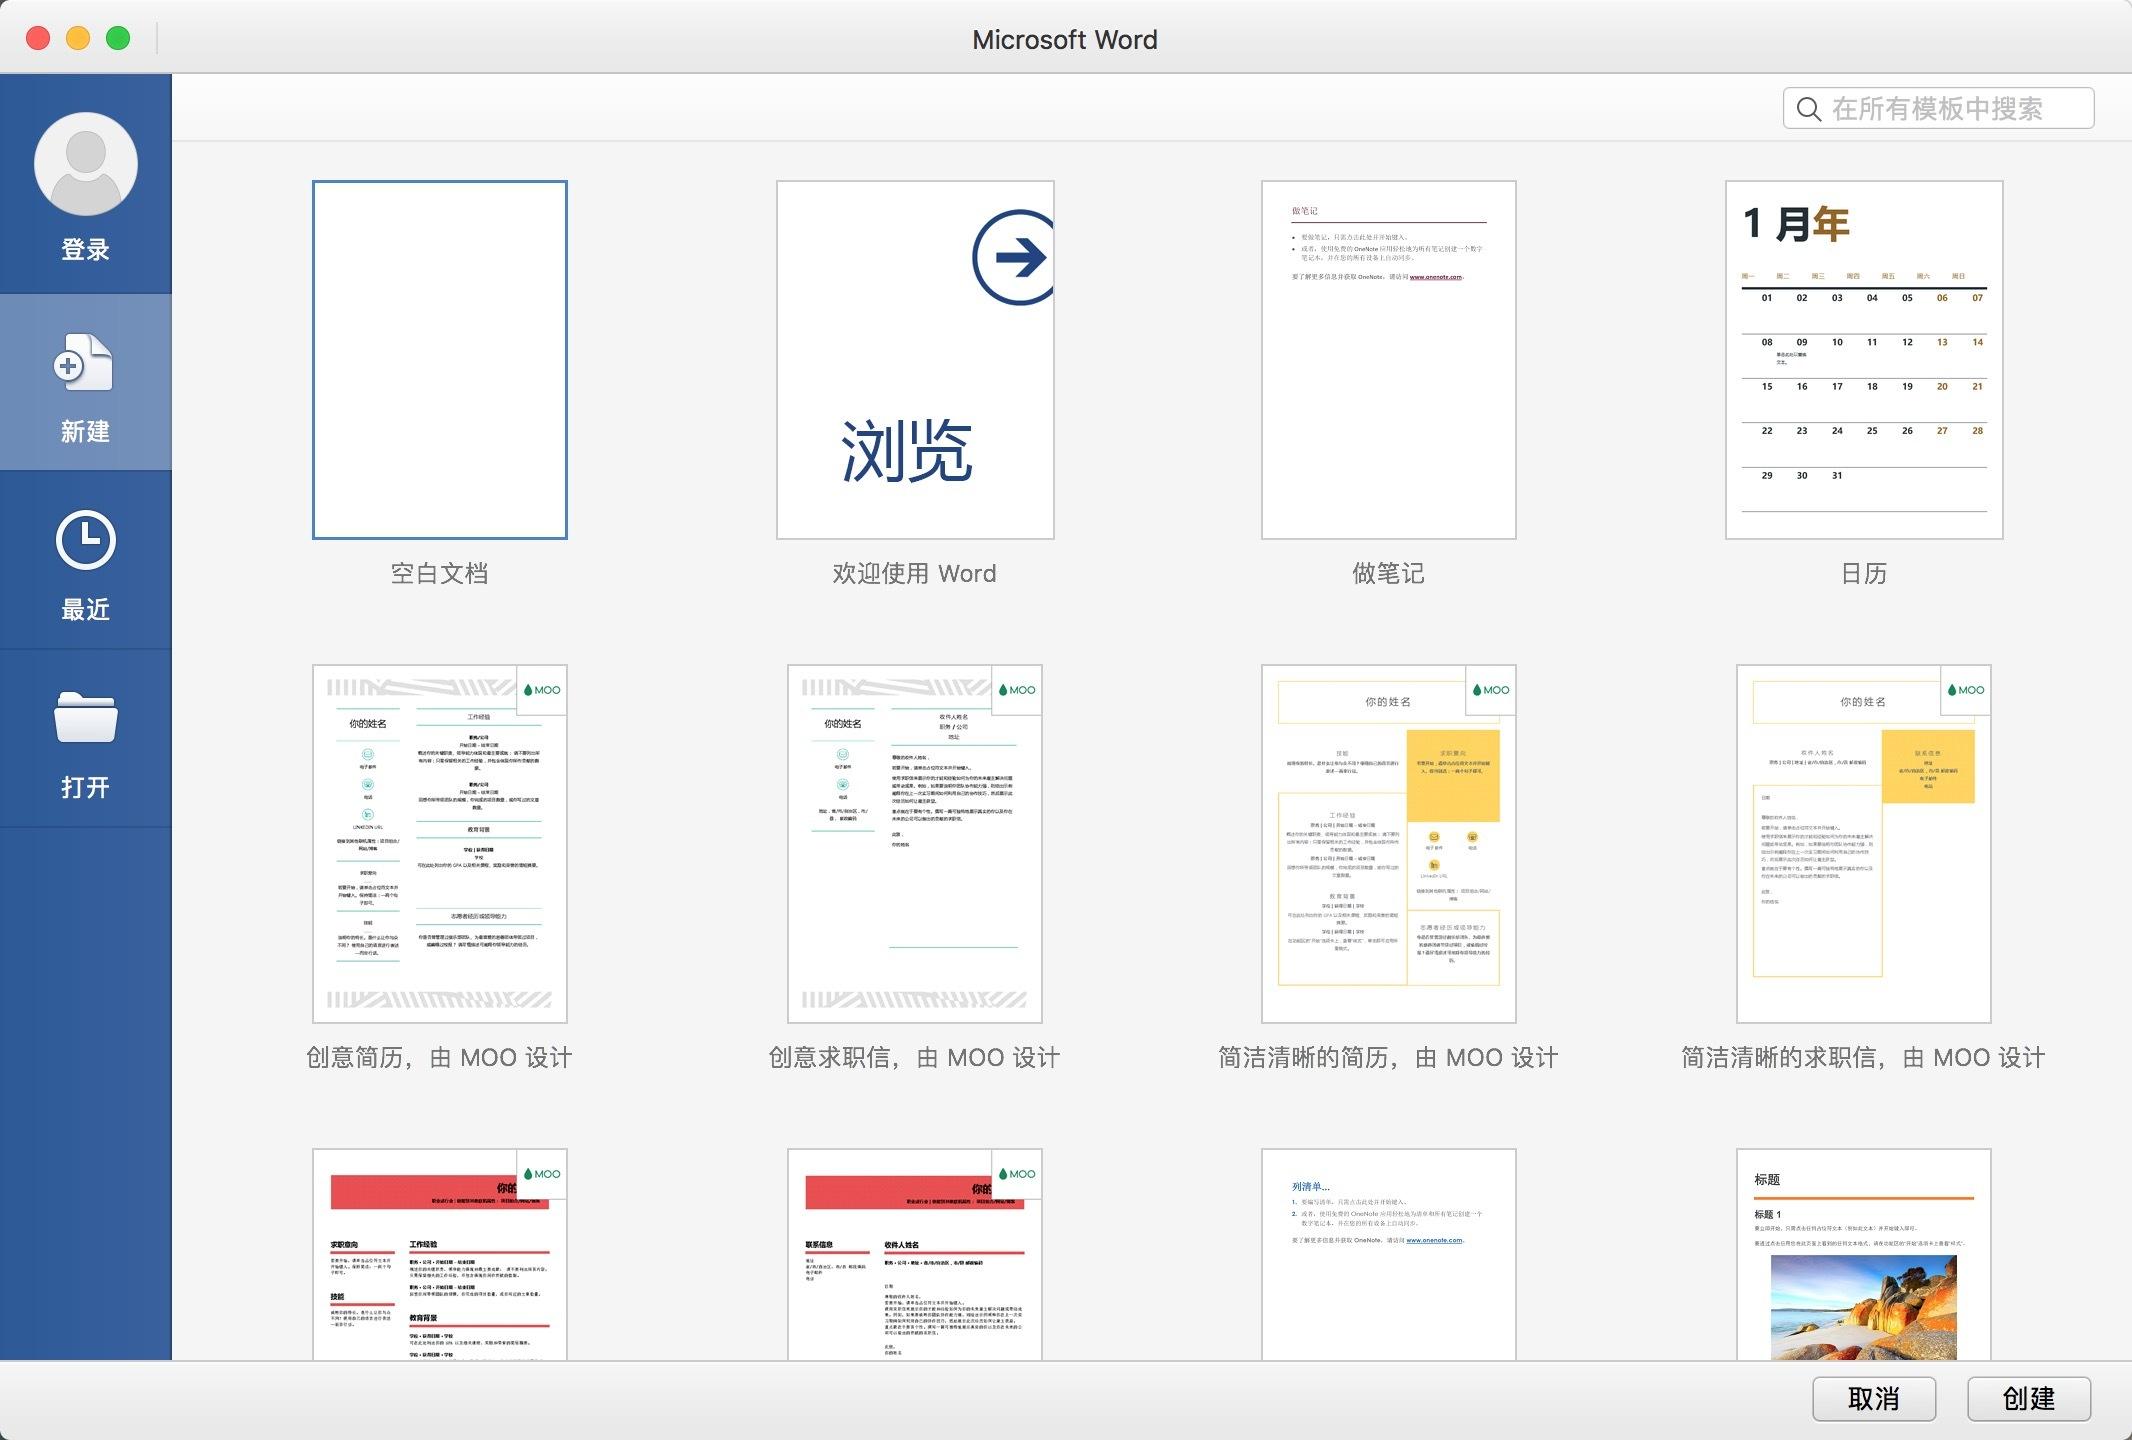 Microsoft Office 2019 for Mac 16.37 VL 办公必备的Office工具-马克喵